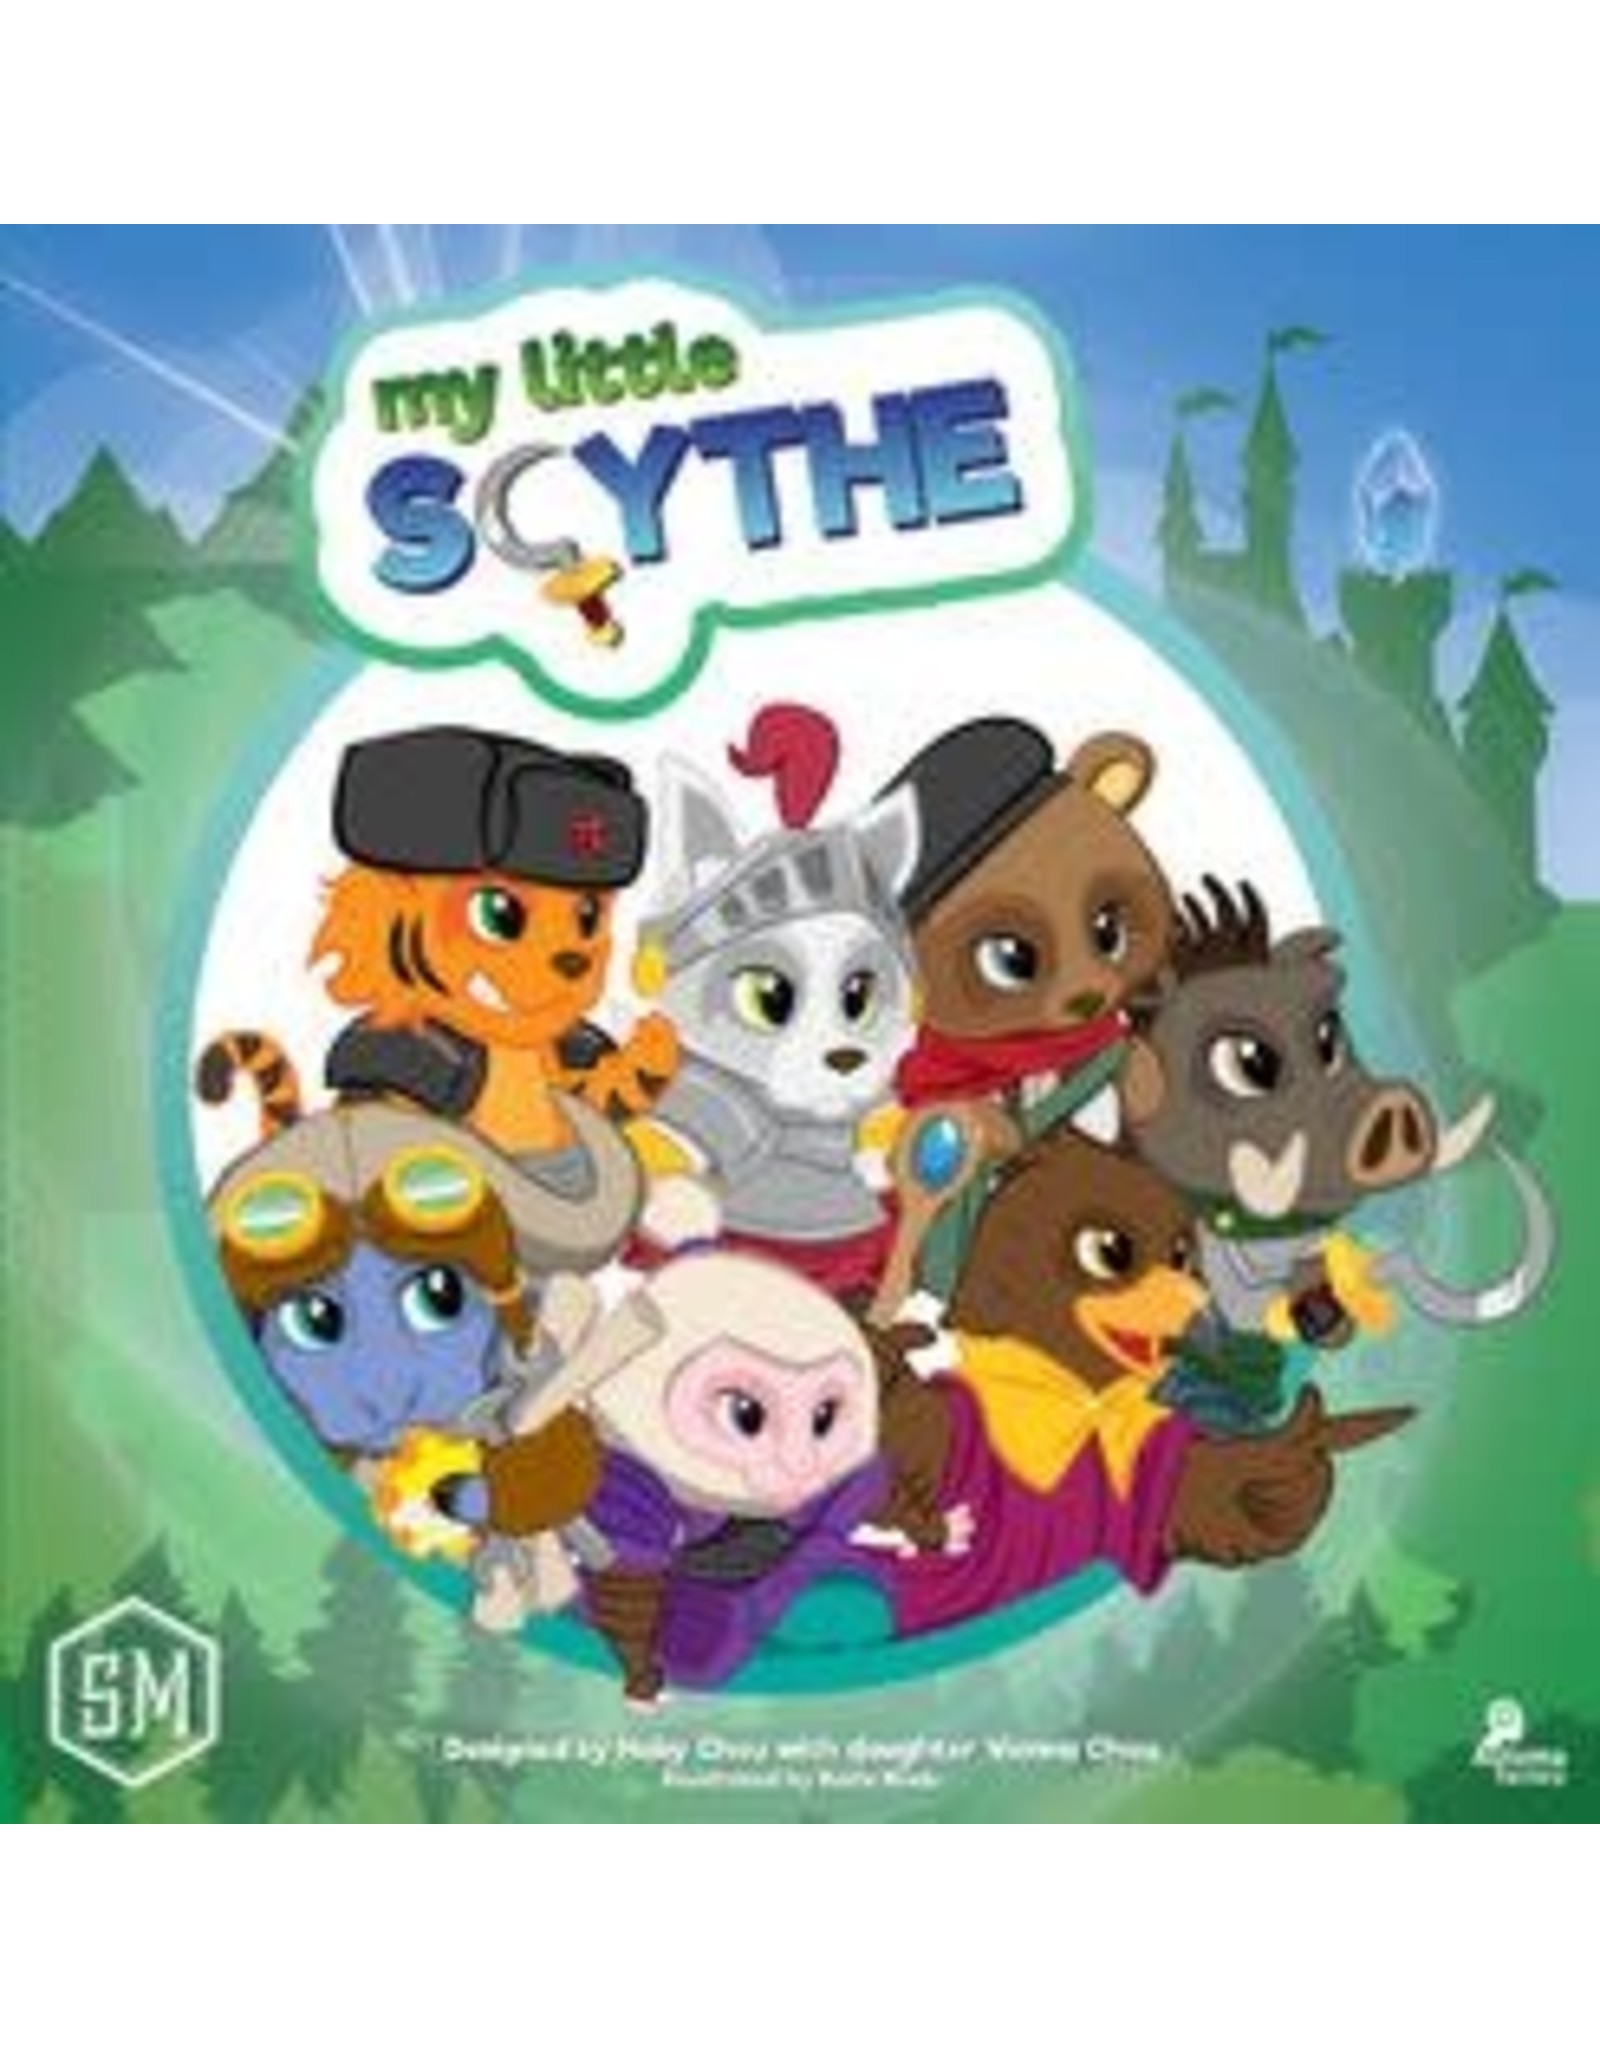 My Little Scythe Board Game